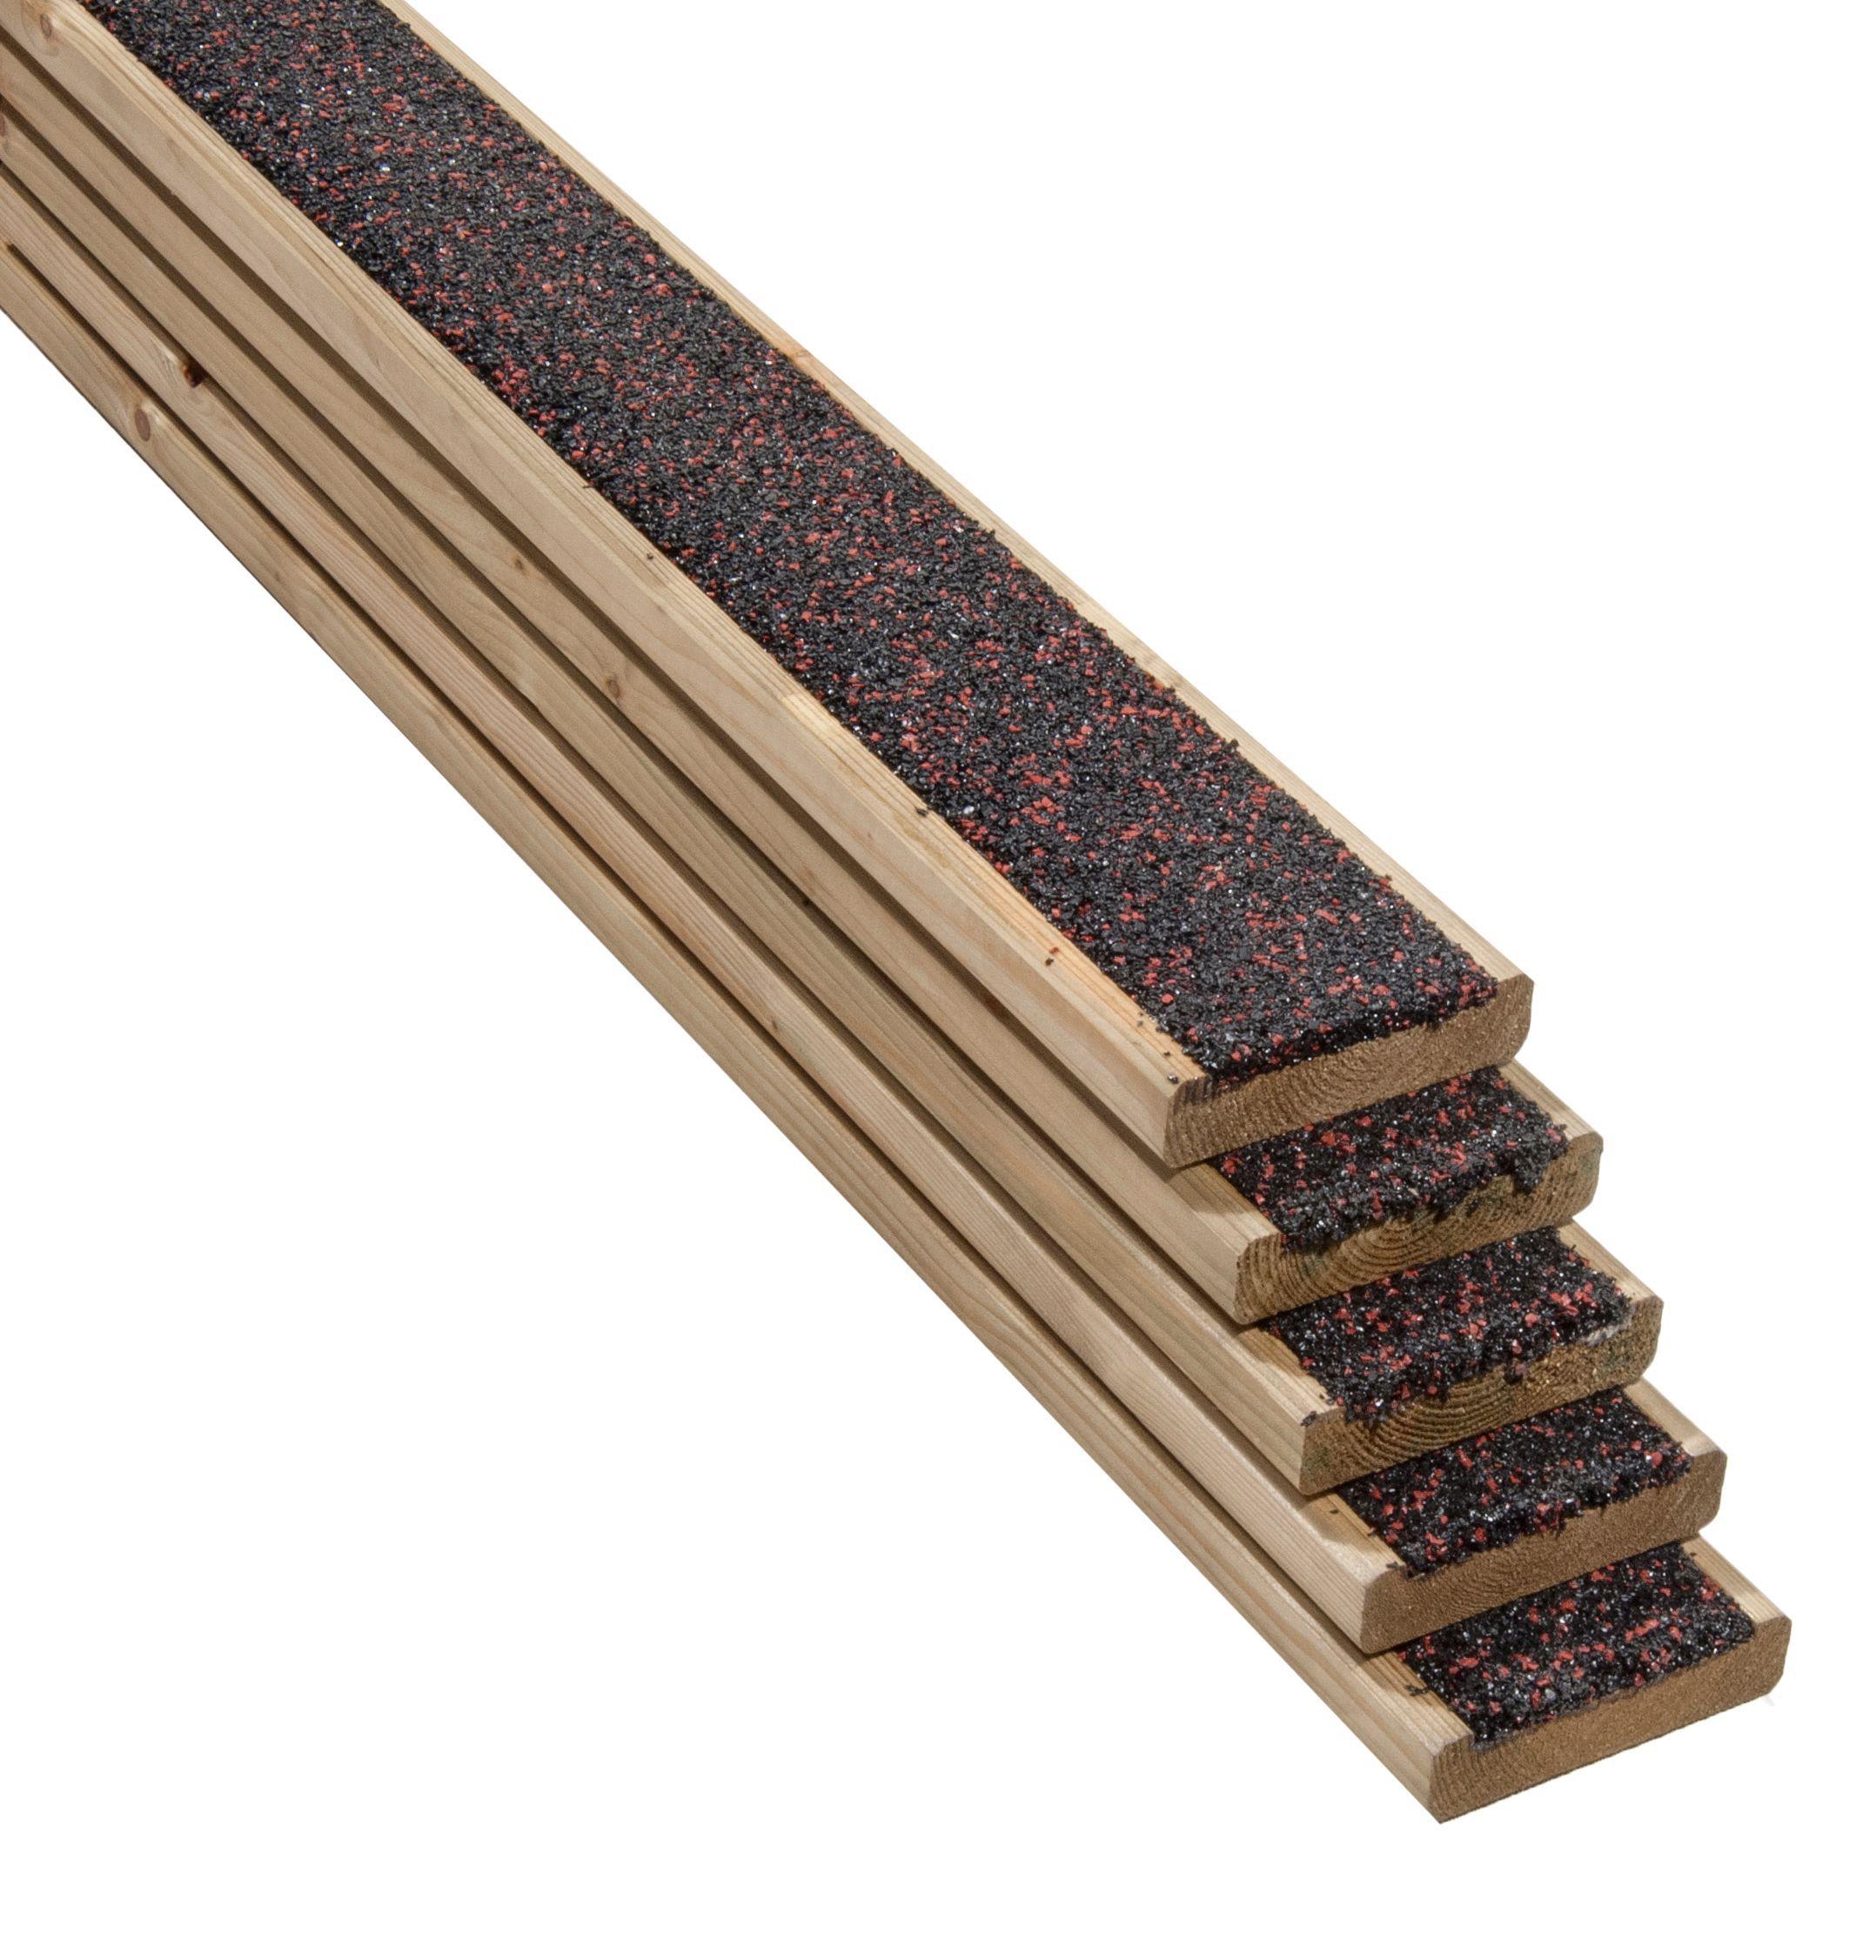 Walksure Softwood Deck Board (t)28mm (w)120mm (l)2100mm, Pack Of 5